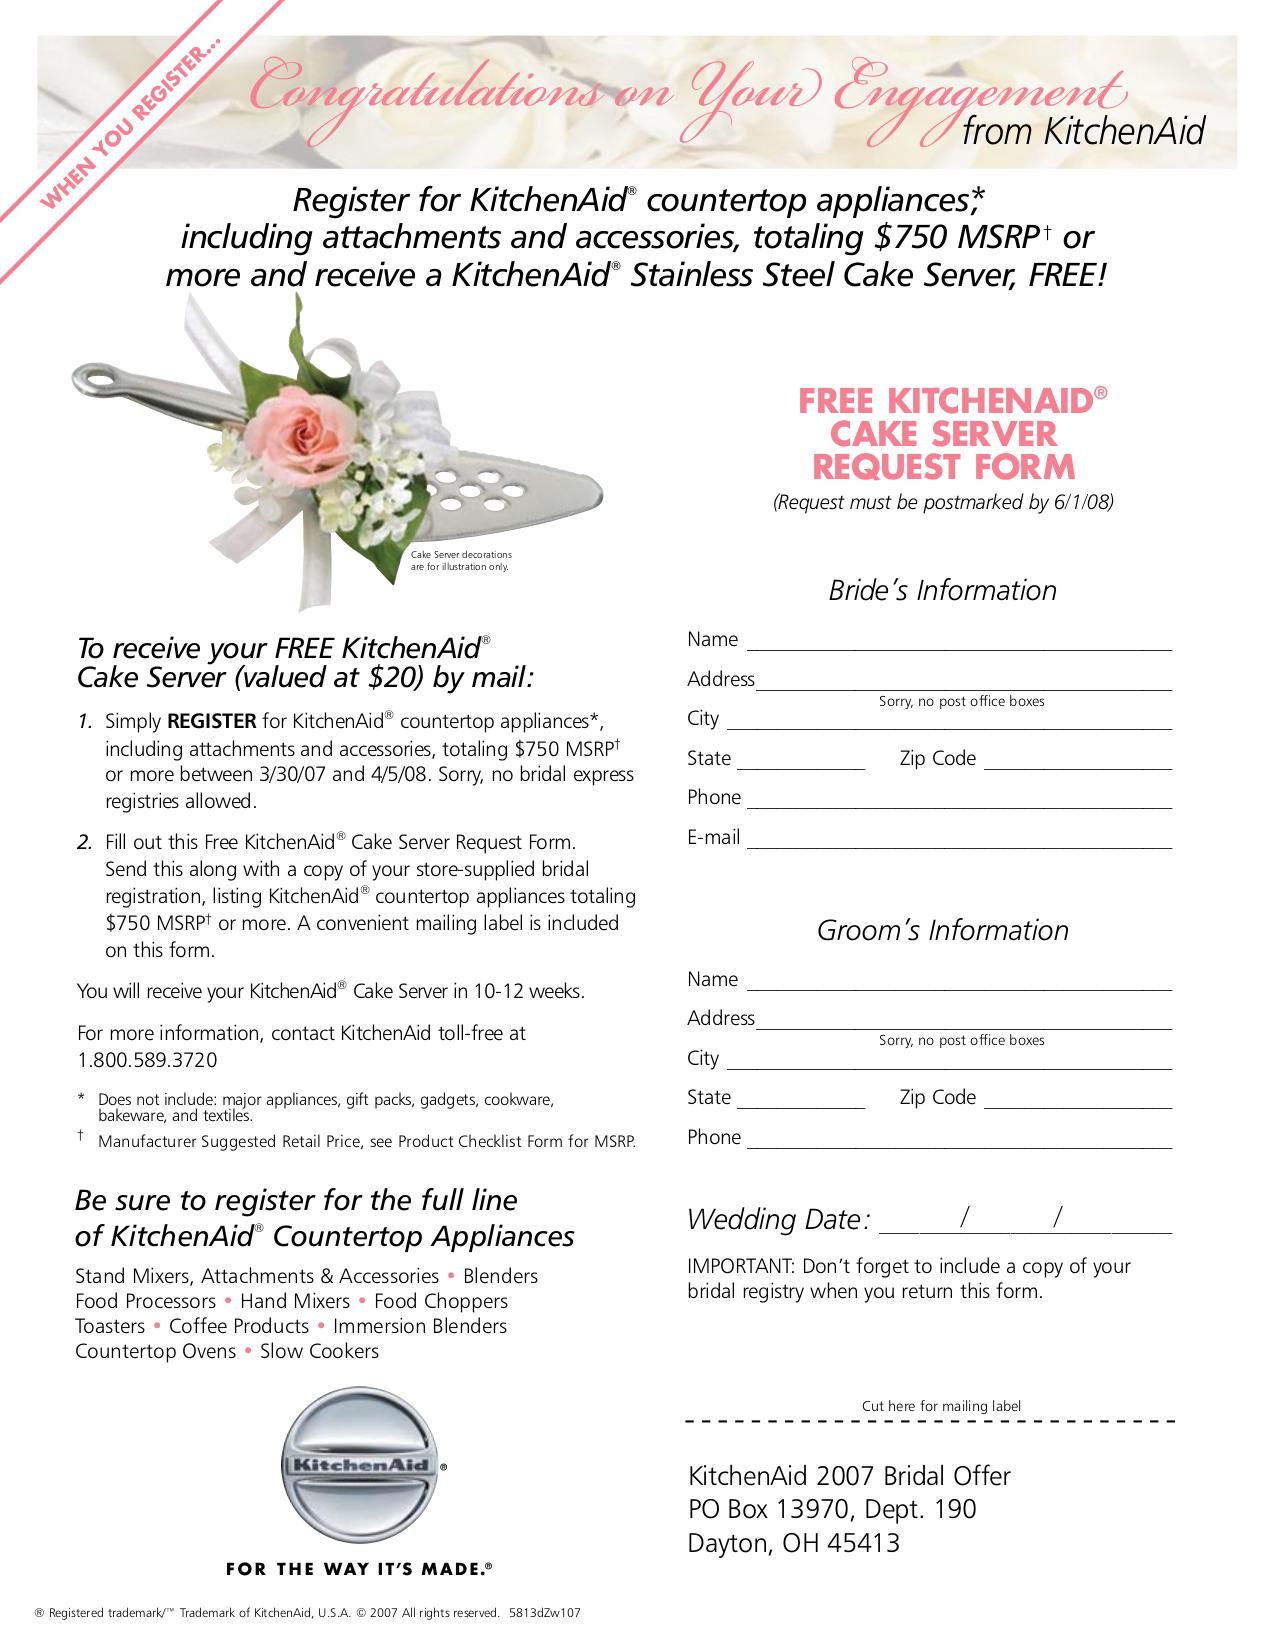 Download free pdf for KitchenAid KV25G0X Food Processor manual